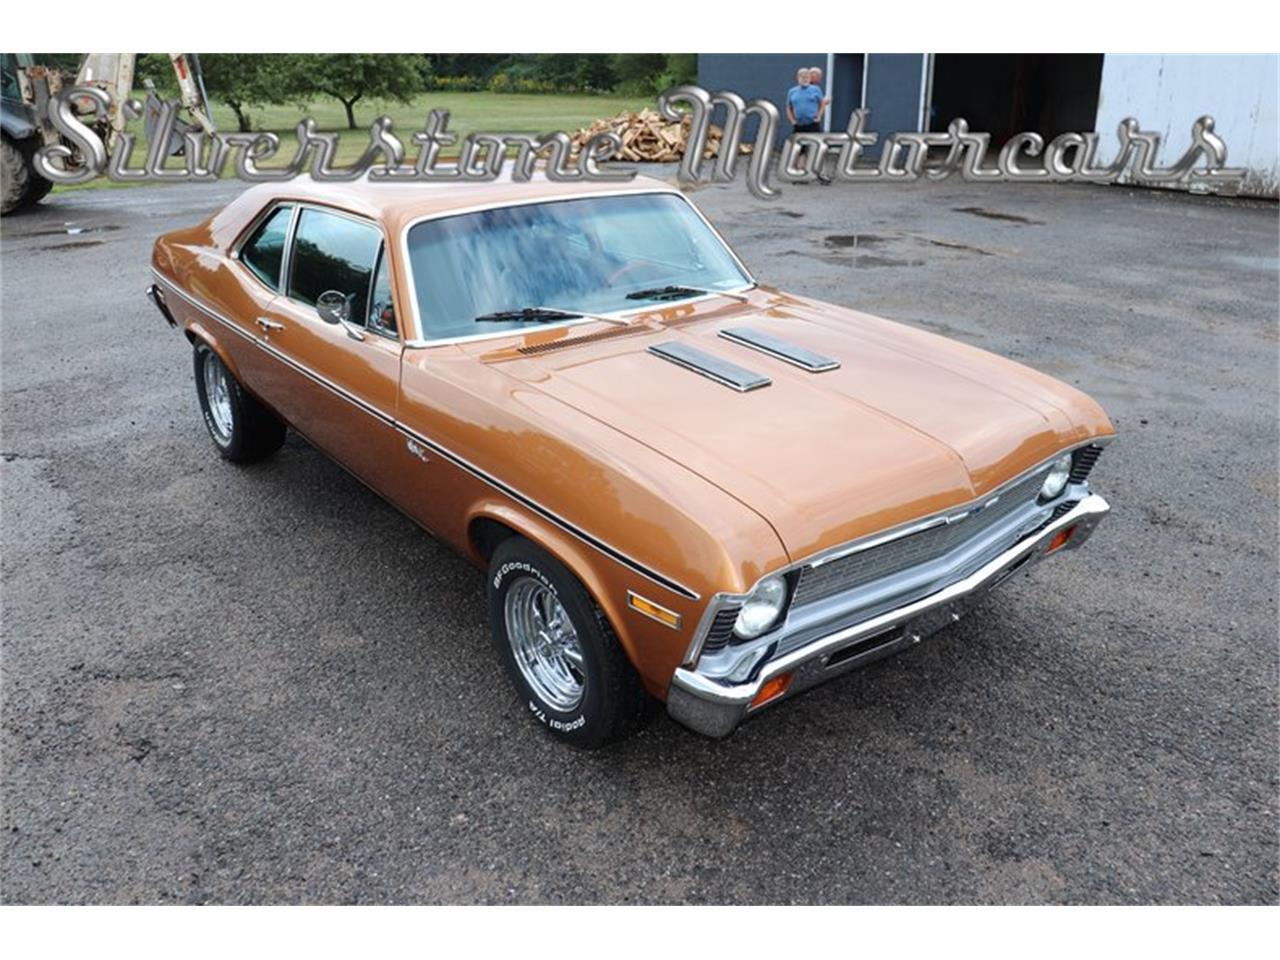 1972 Chevrolet Nova (CC-1248037) for sale in North Andover, Massachusetts